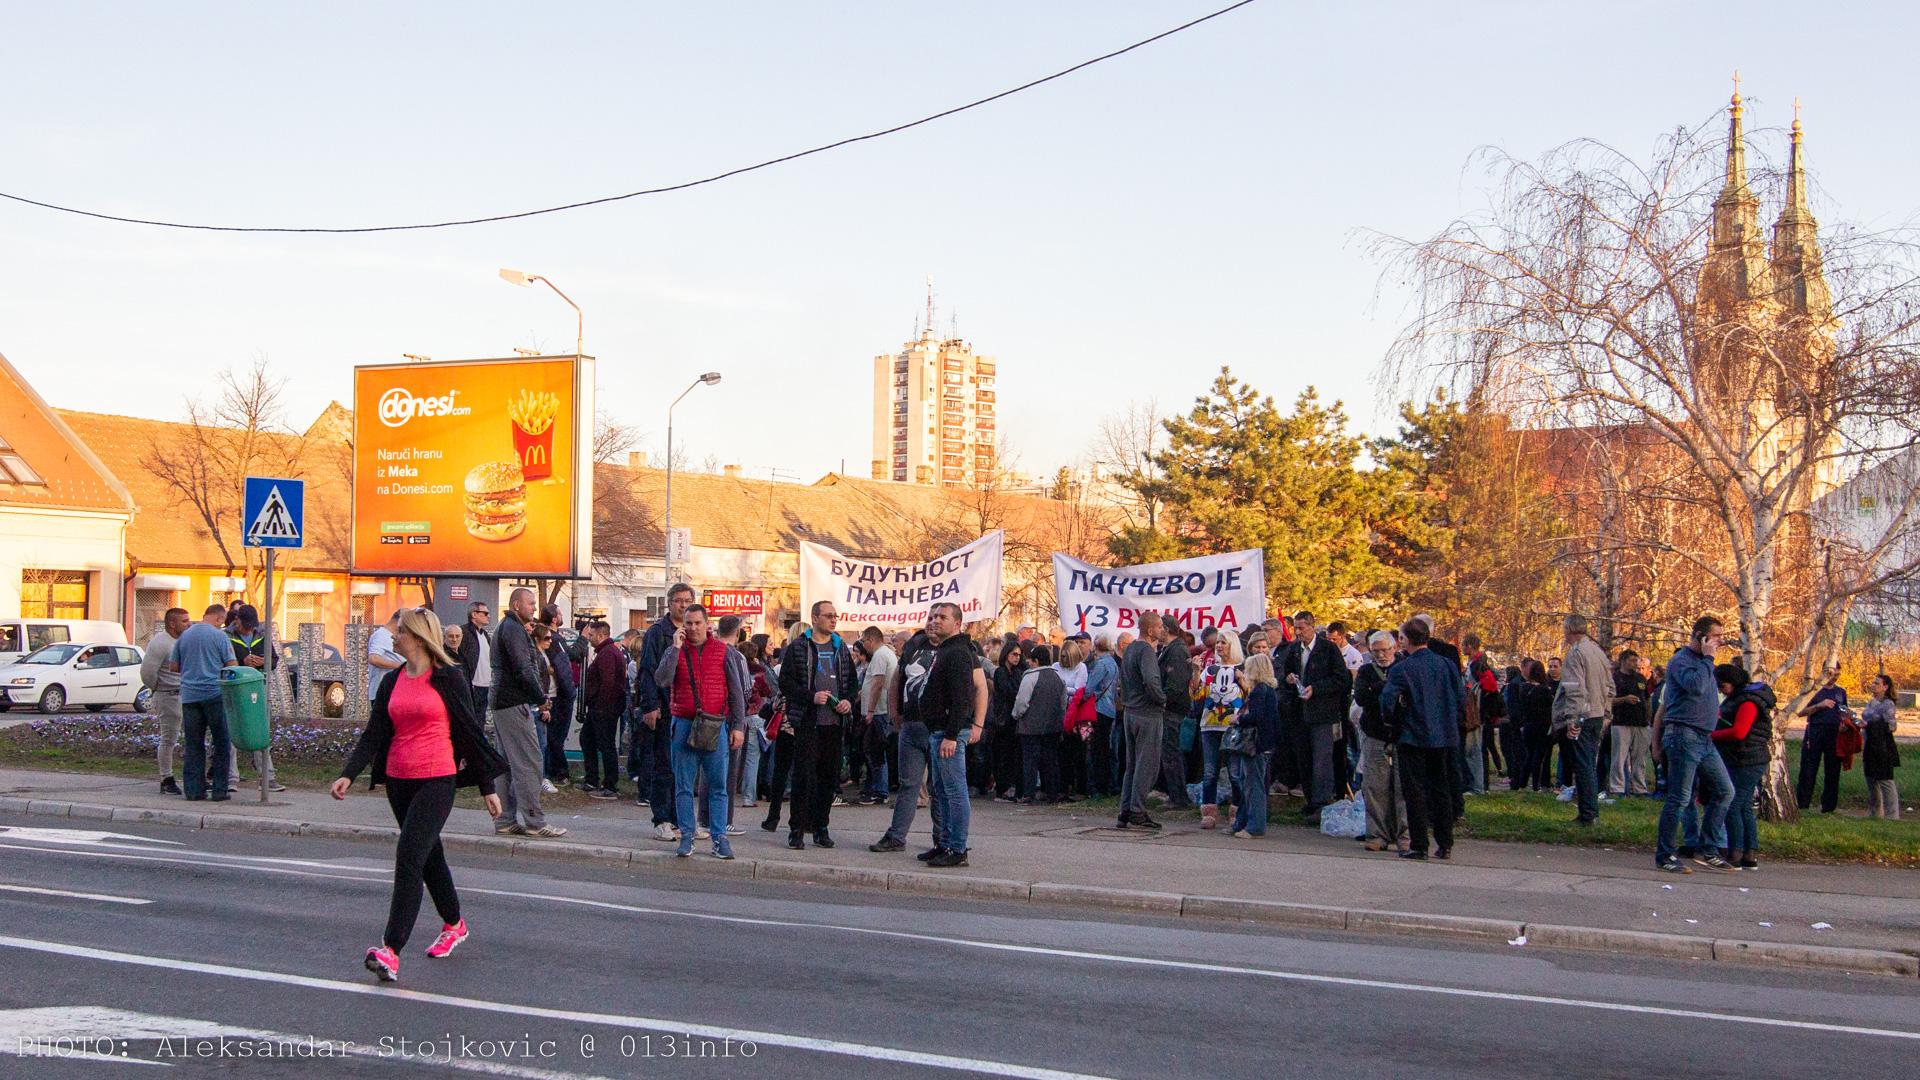 Skup podrške Aleksandru Vučiću u Pančevu